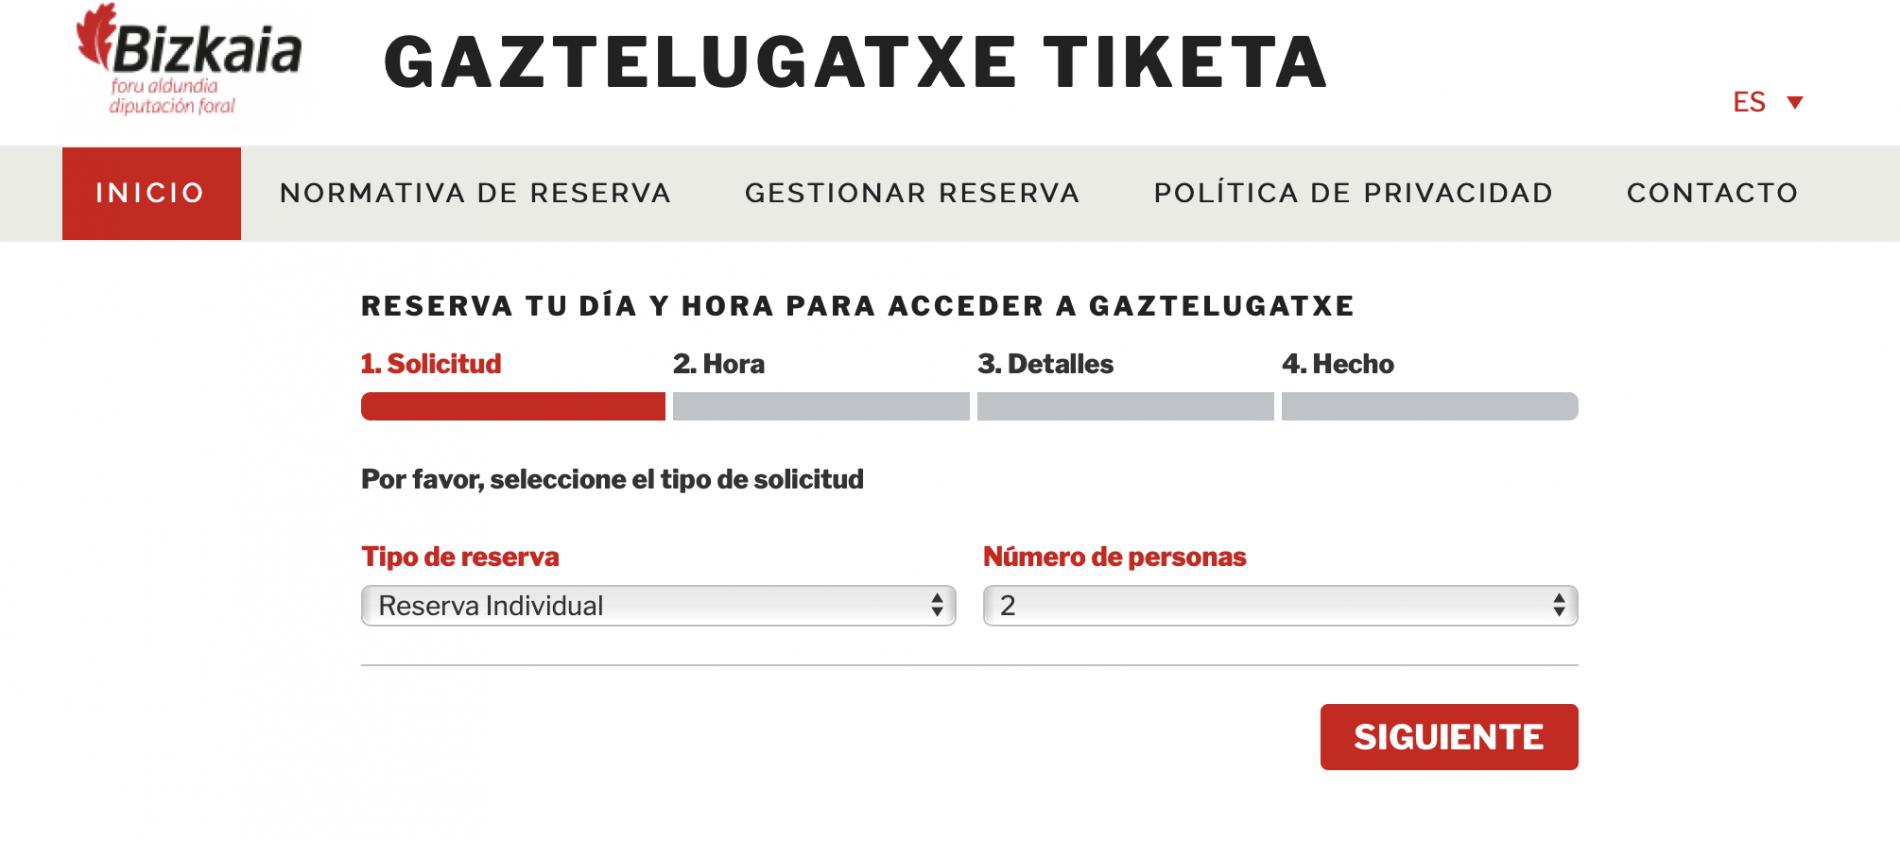 Proceso de reserva de tickets. Visitar San Juan de Gaztelugatxe